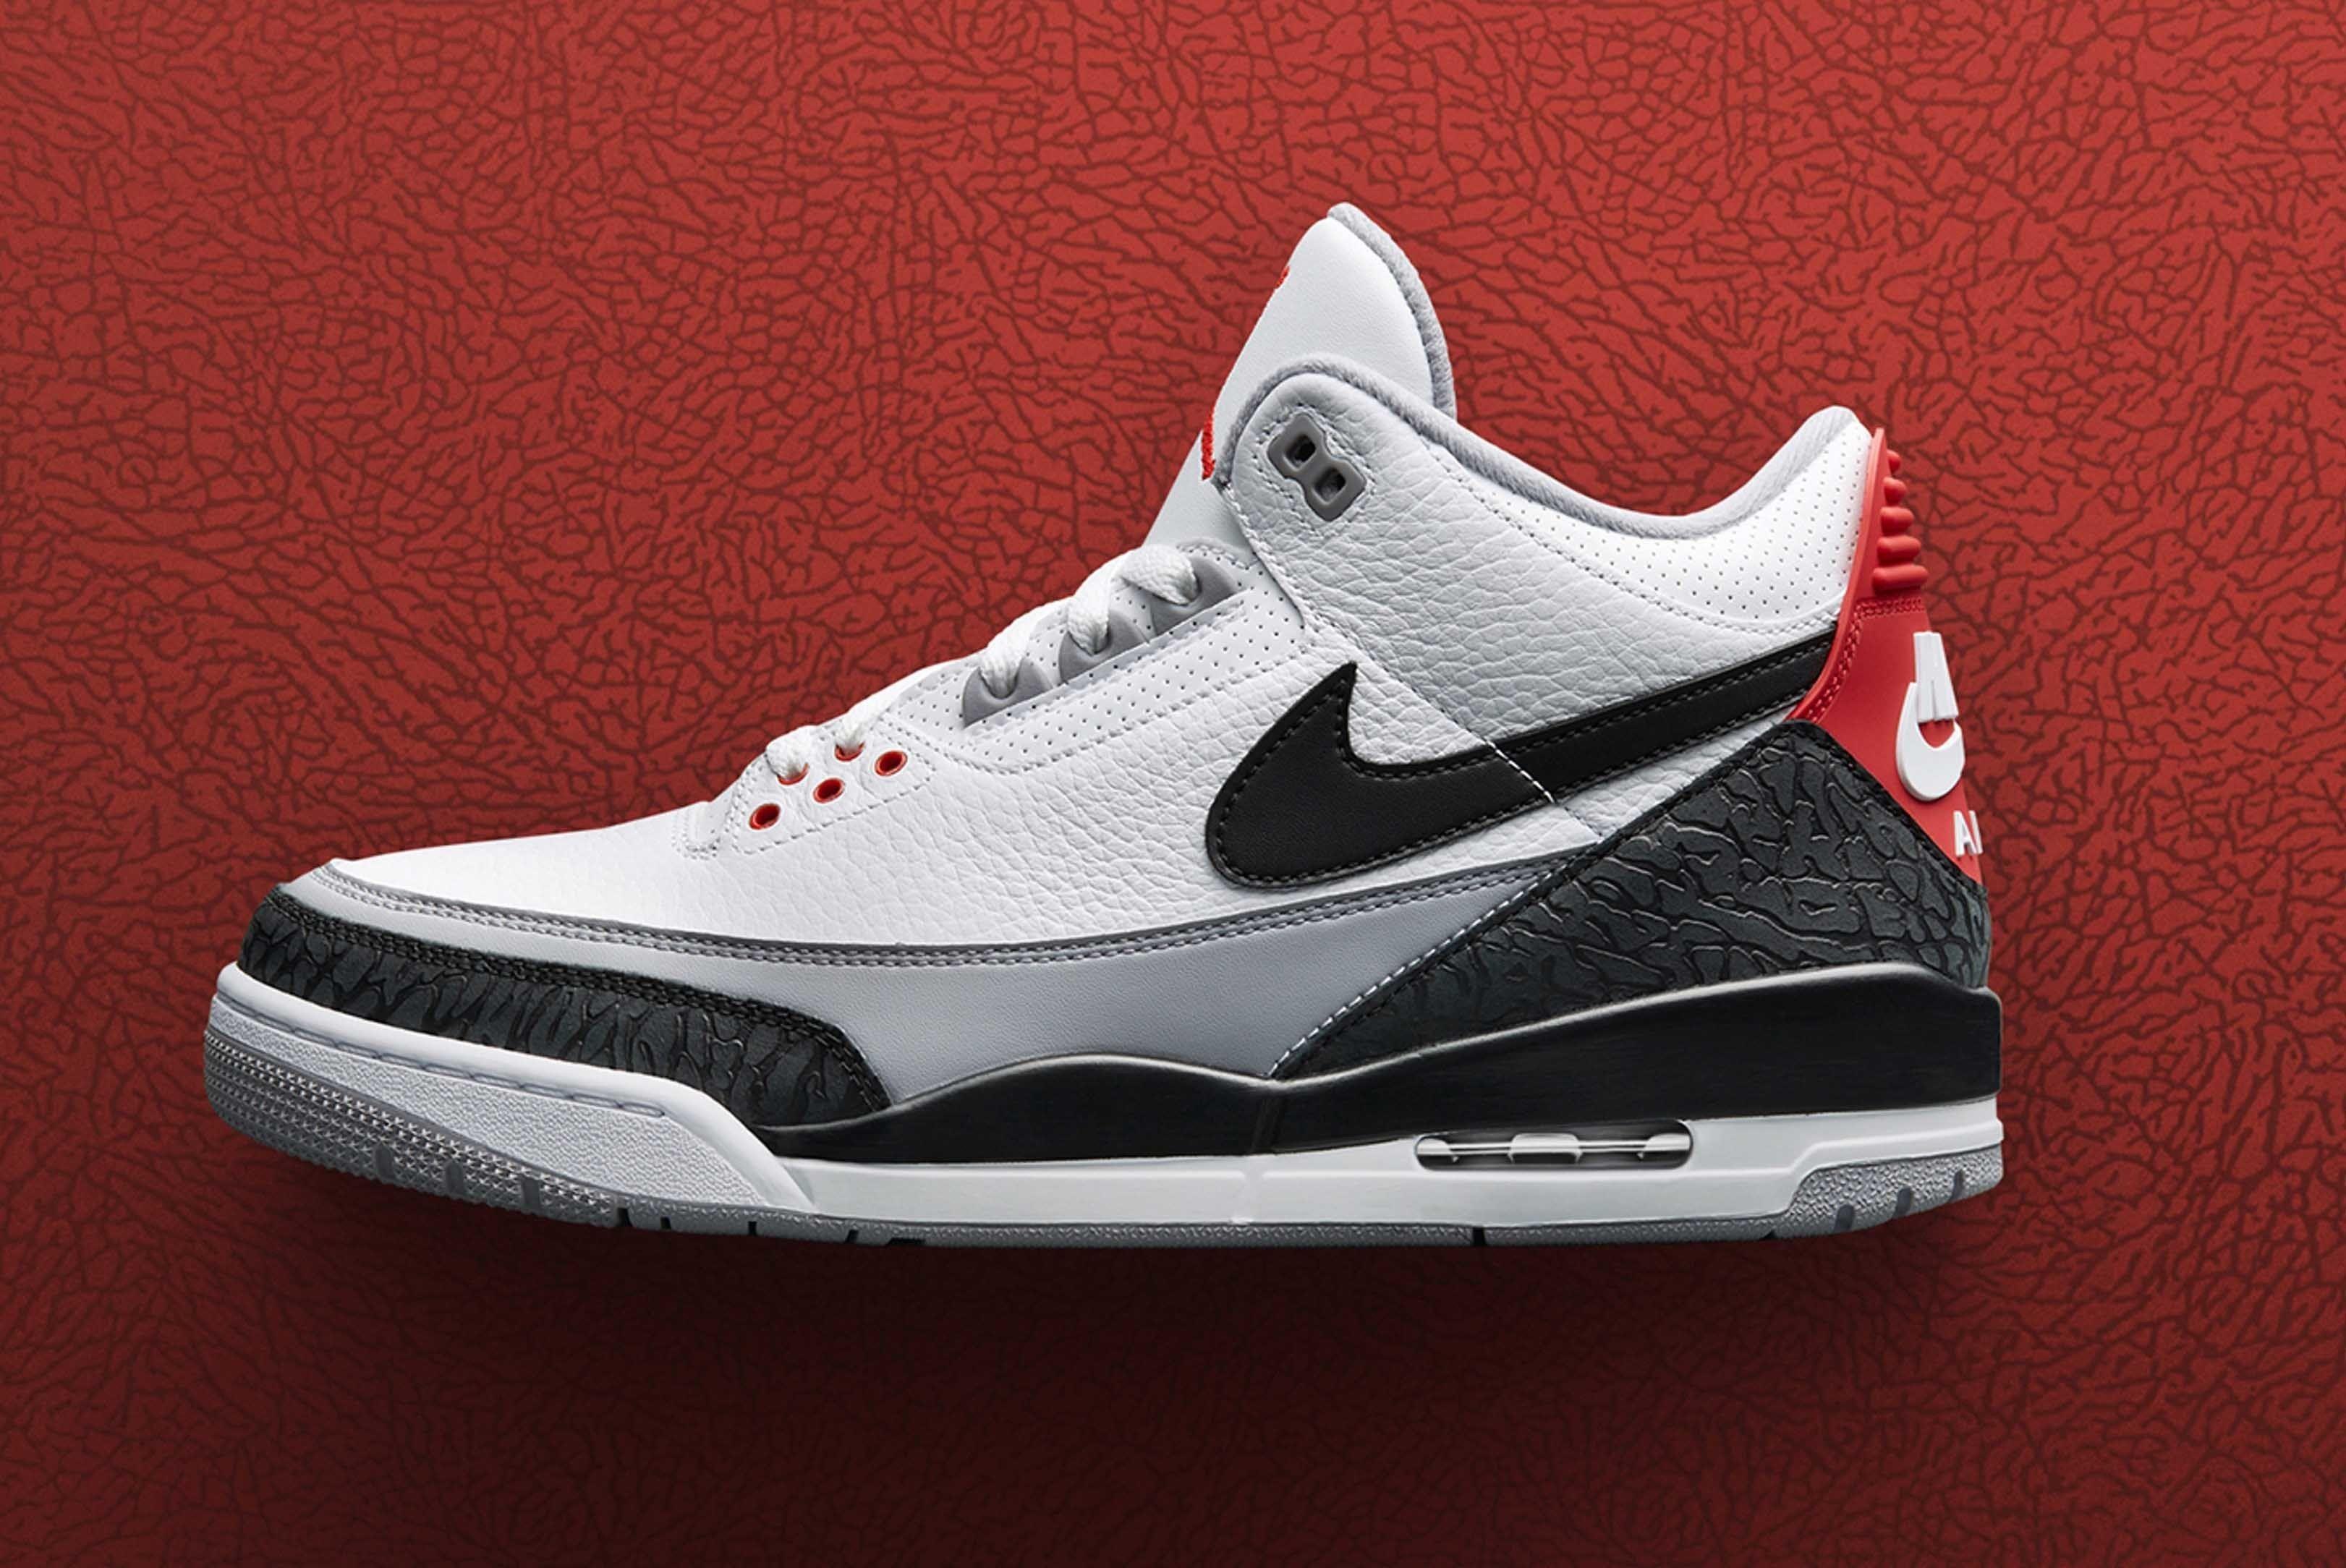 Air Jordan 3 Tinker Hatfield Birthday Release 1 Sneaker Freaker